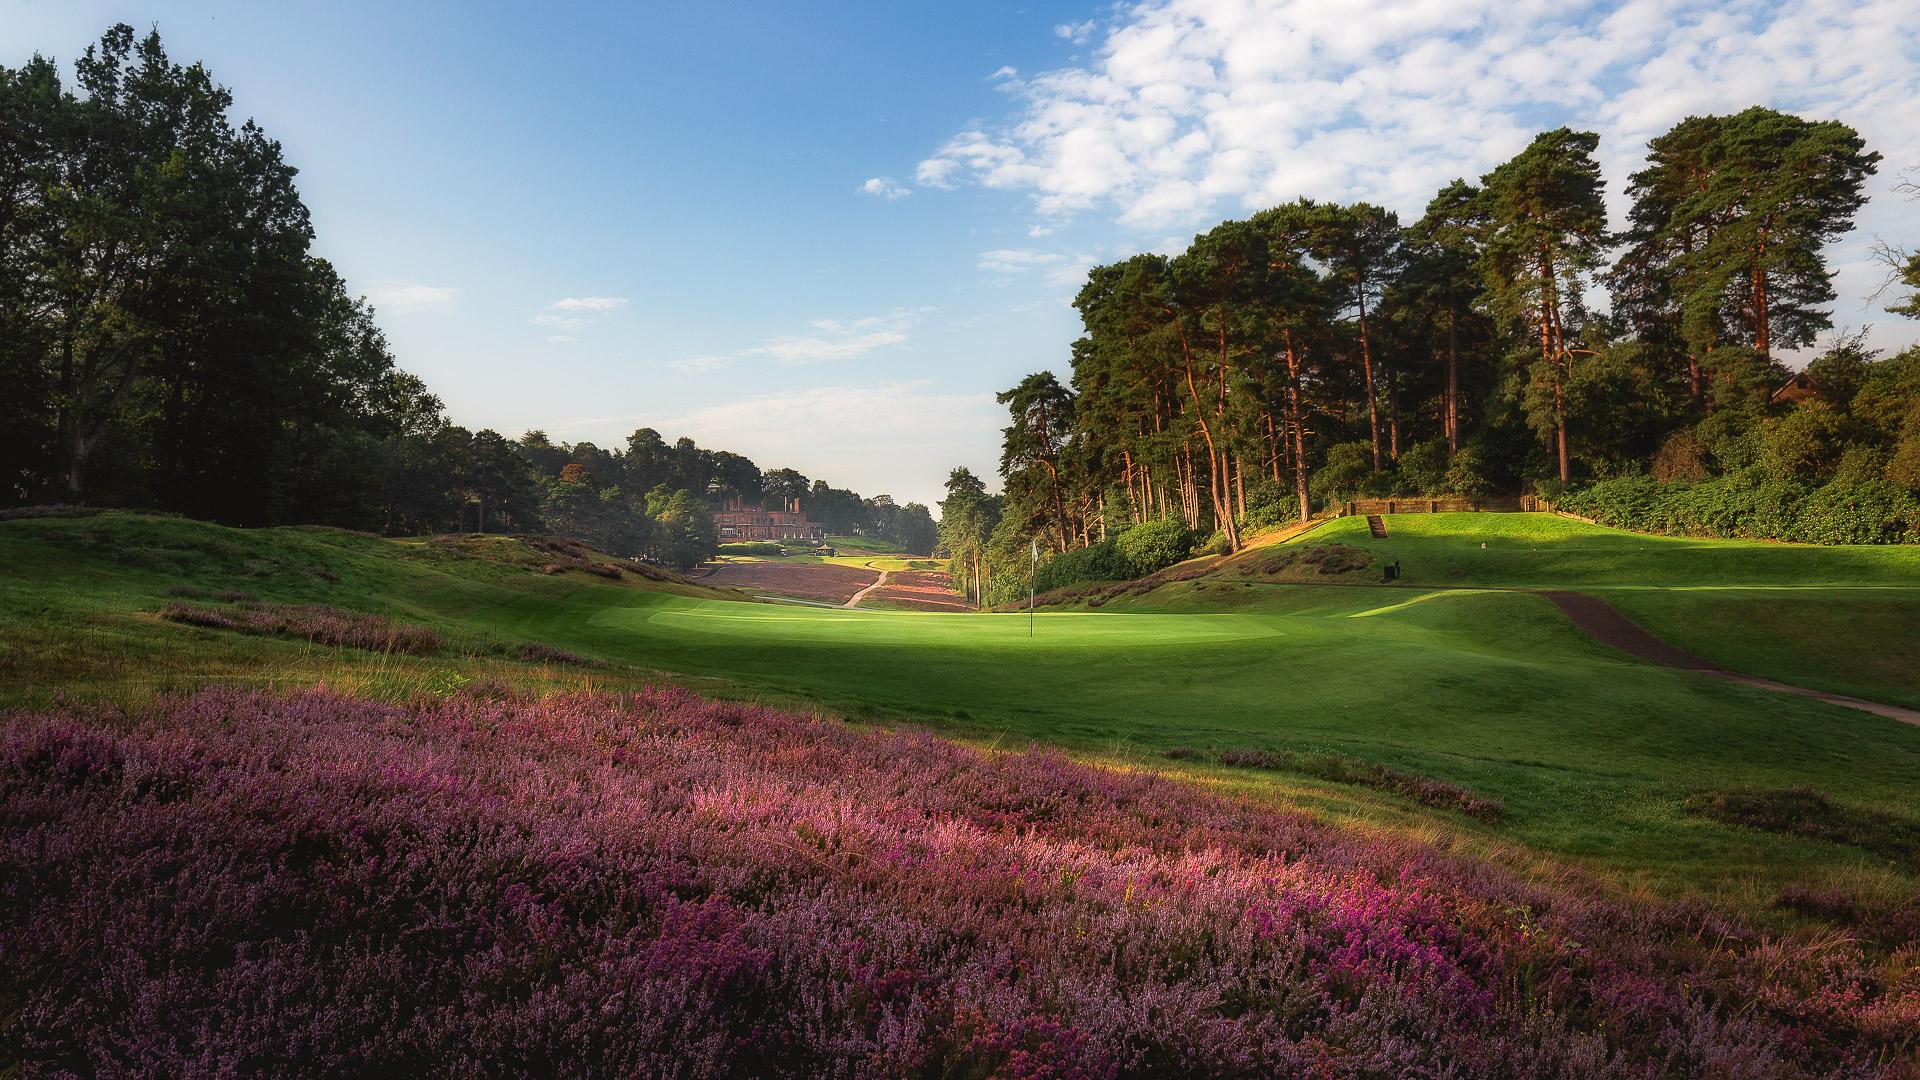 01st-Hole-St-Georges-Hill-Golf-Club-2351-Edit